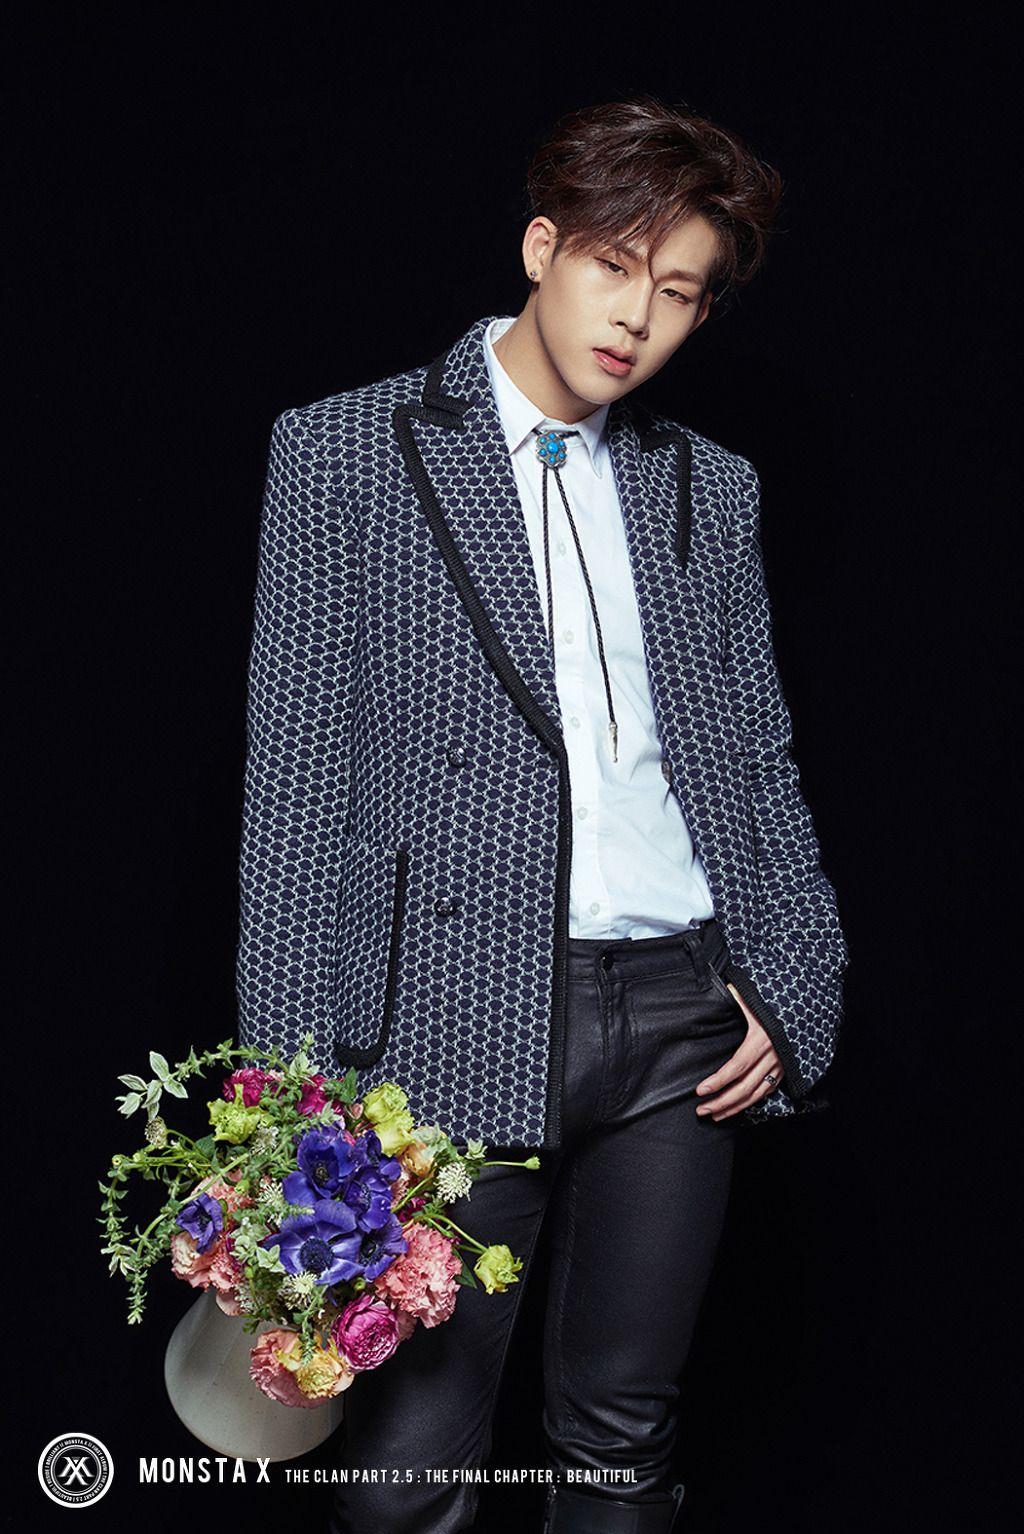 Monsta x The clan 2.5: Beautiful Jooheon